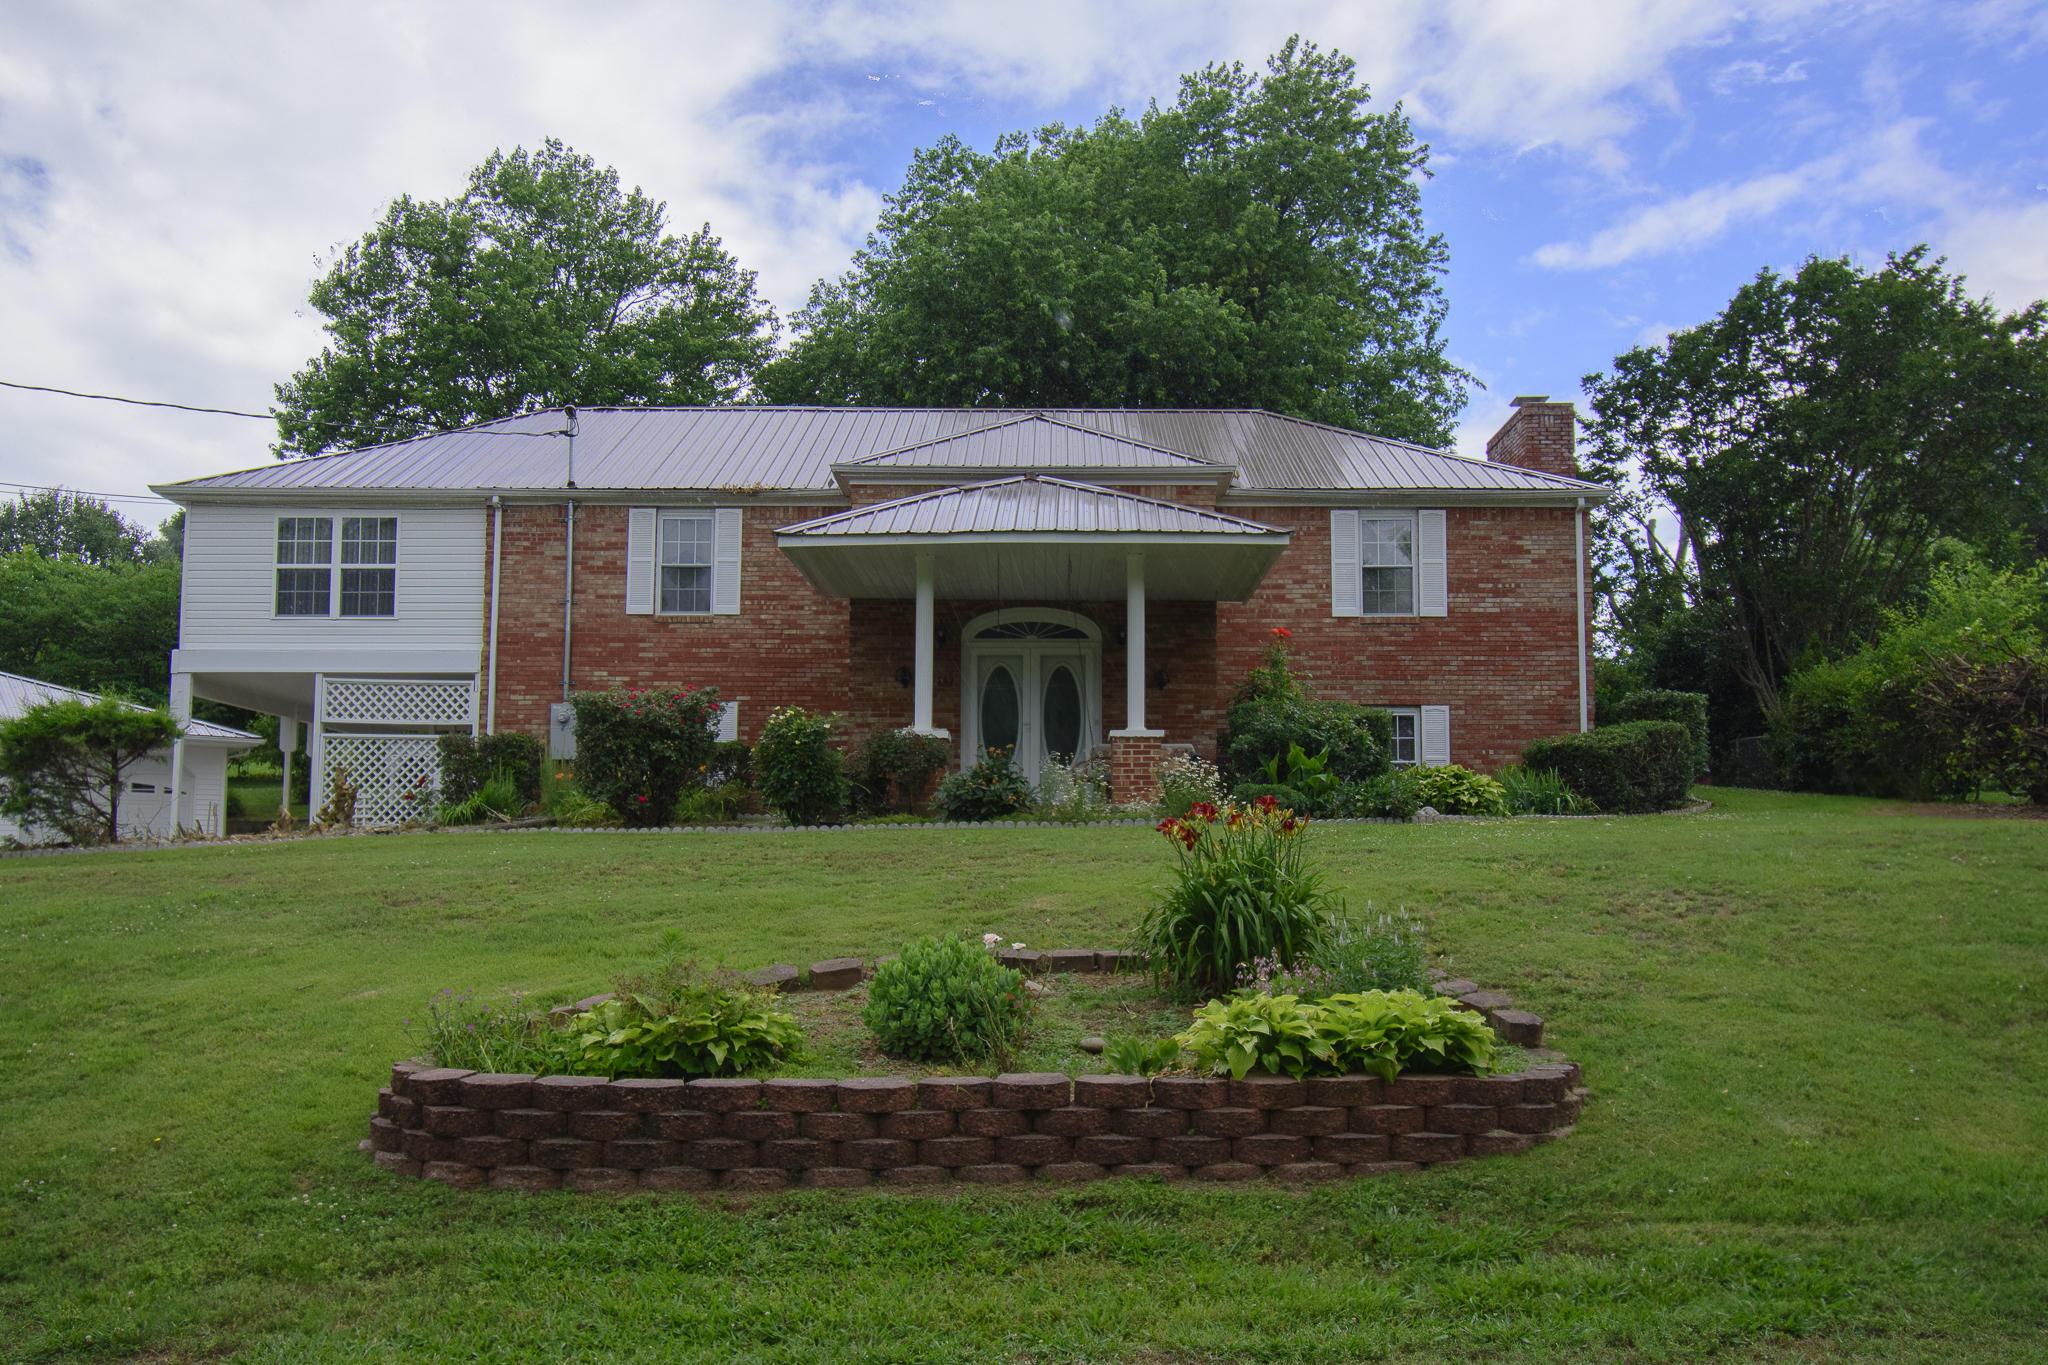 1769 Ponder Drive, Talbott, Tennessee 37877, 3 Bedrooms Bedrooms, ,2 BathroomsBathrooms,Single Family,For Sale,Ponder,1120107